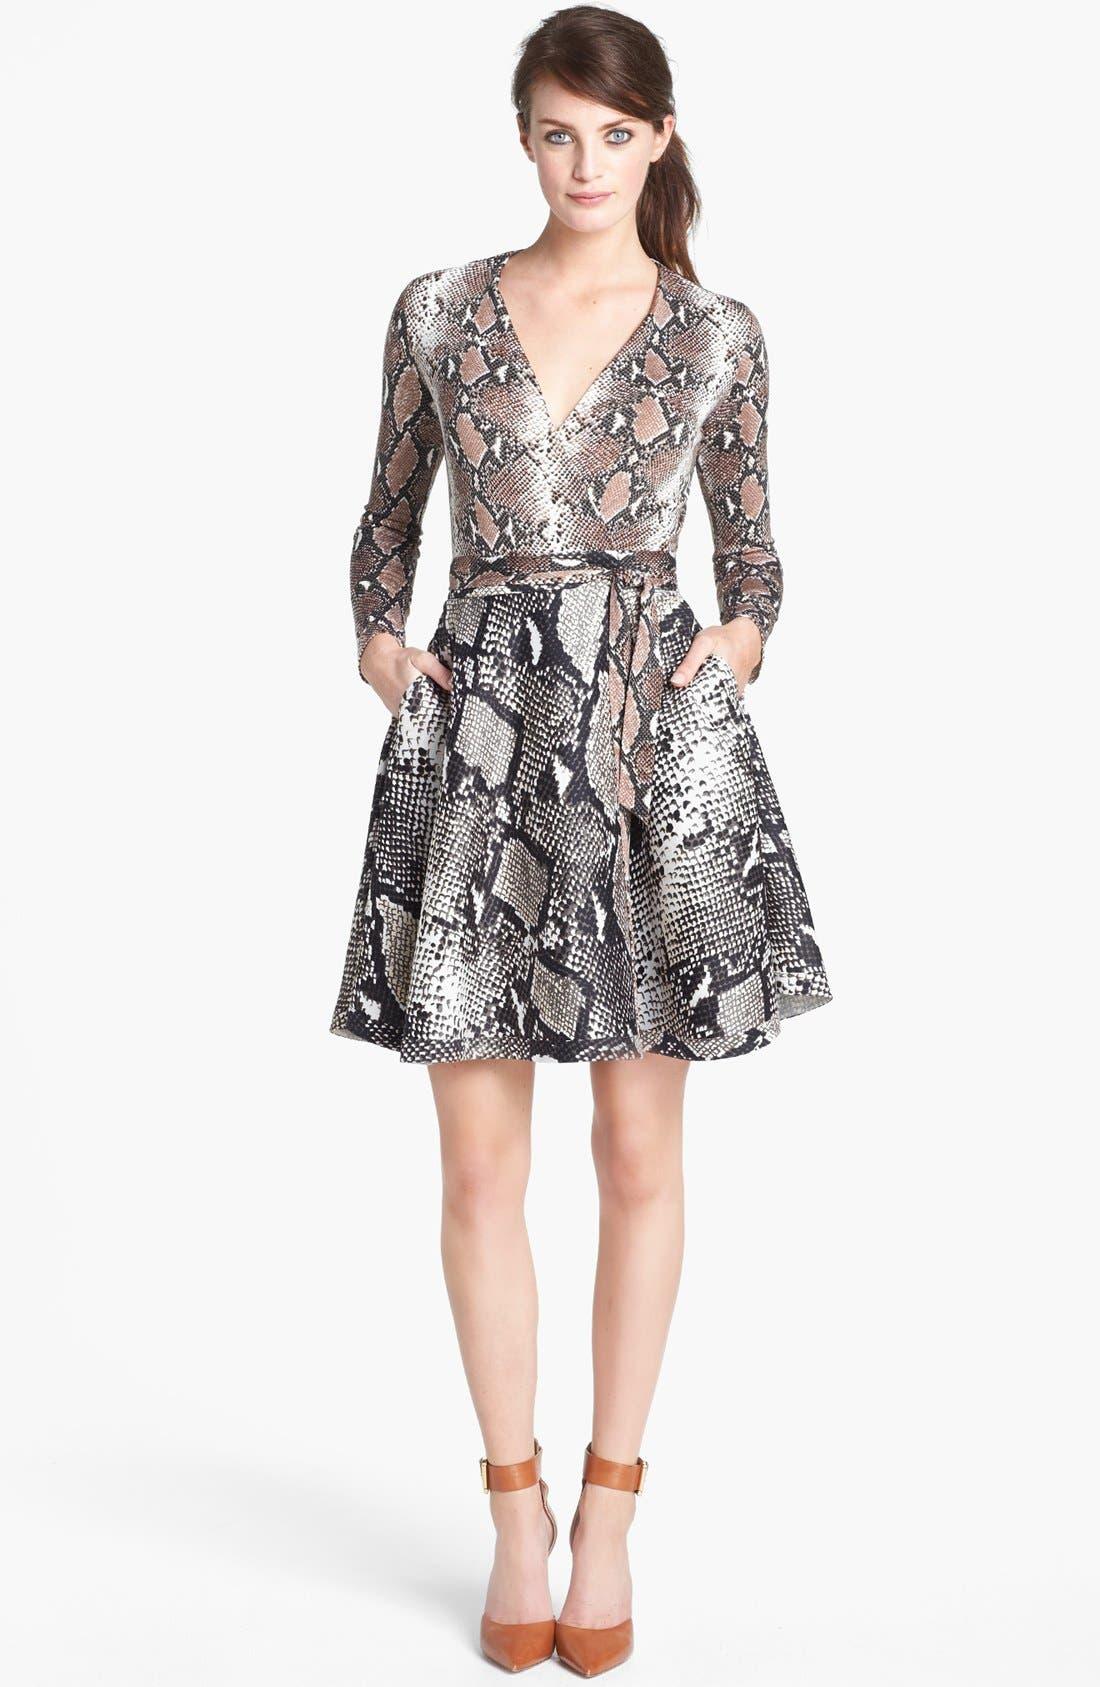 Alternate Image 1 Selected - Diane von Furstenberg 'Amelia' Knit Silk Wrap Dress